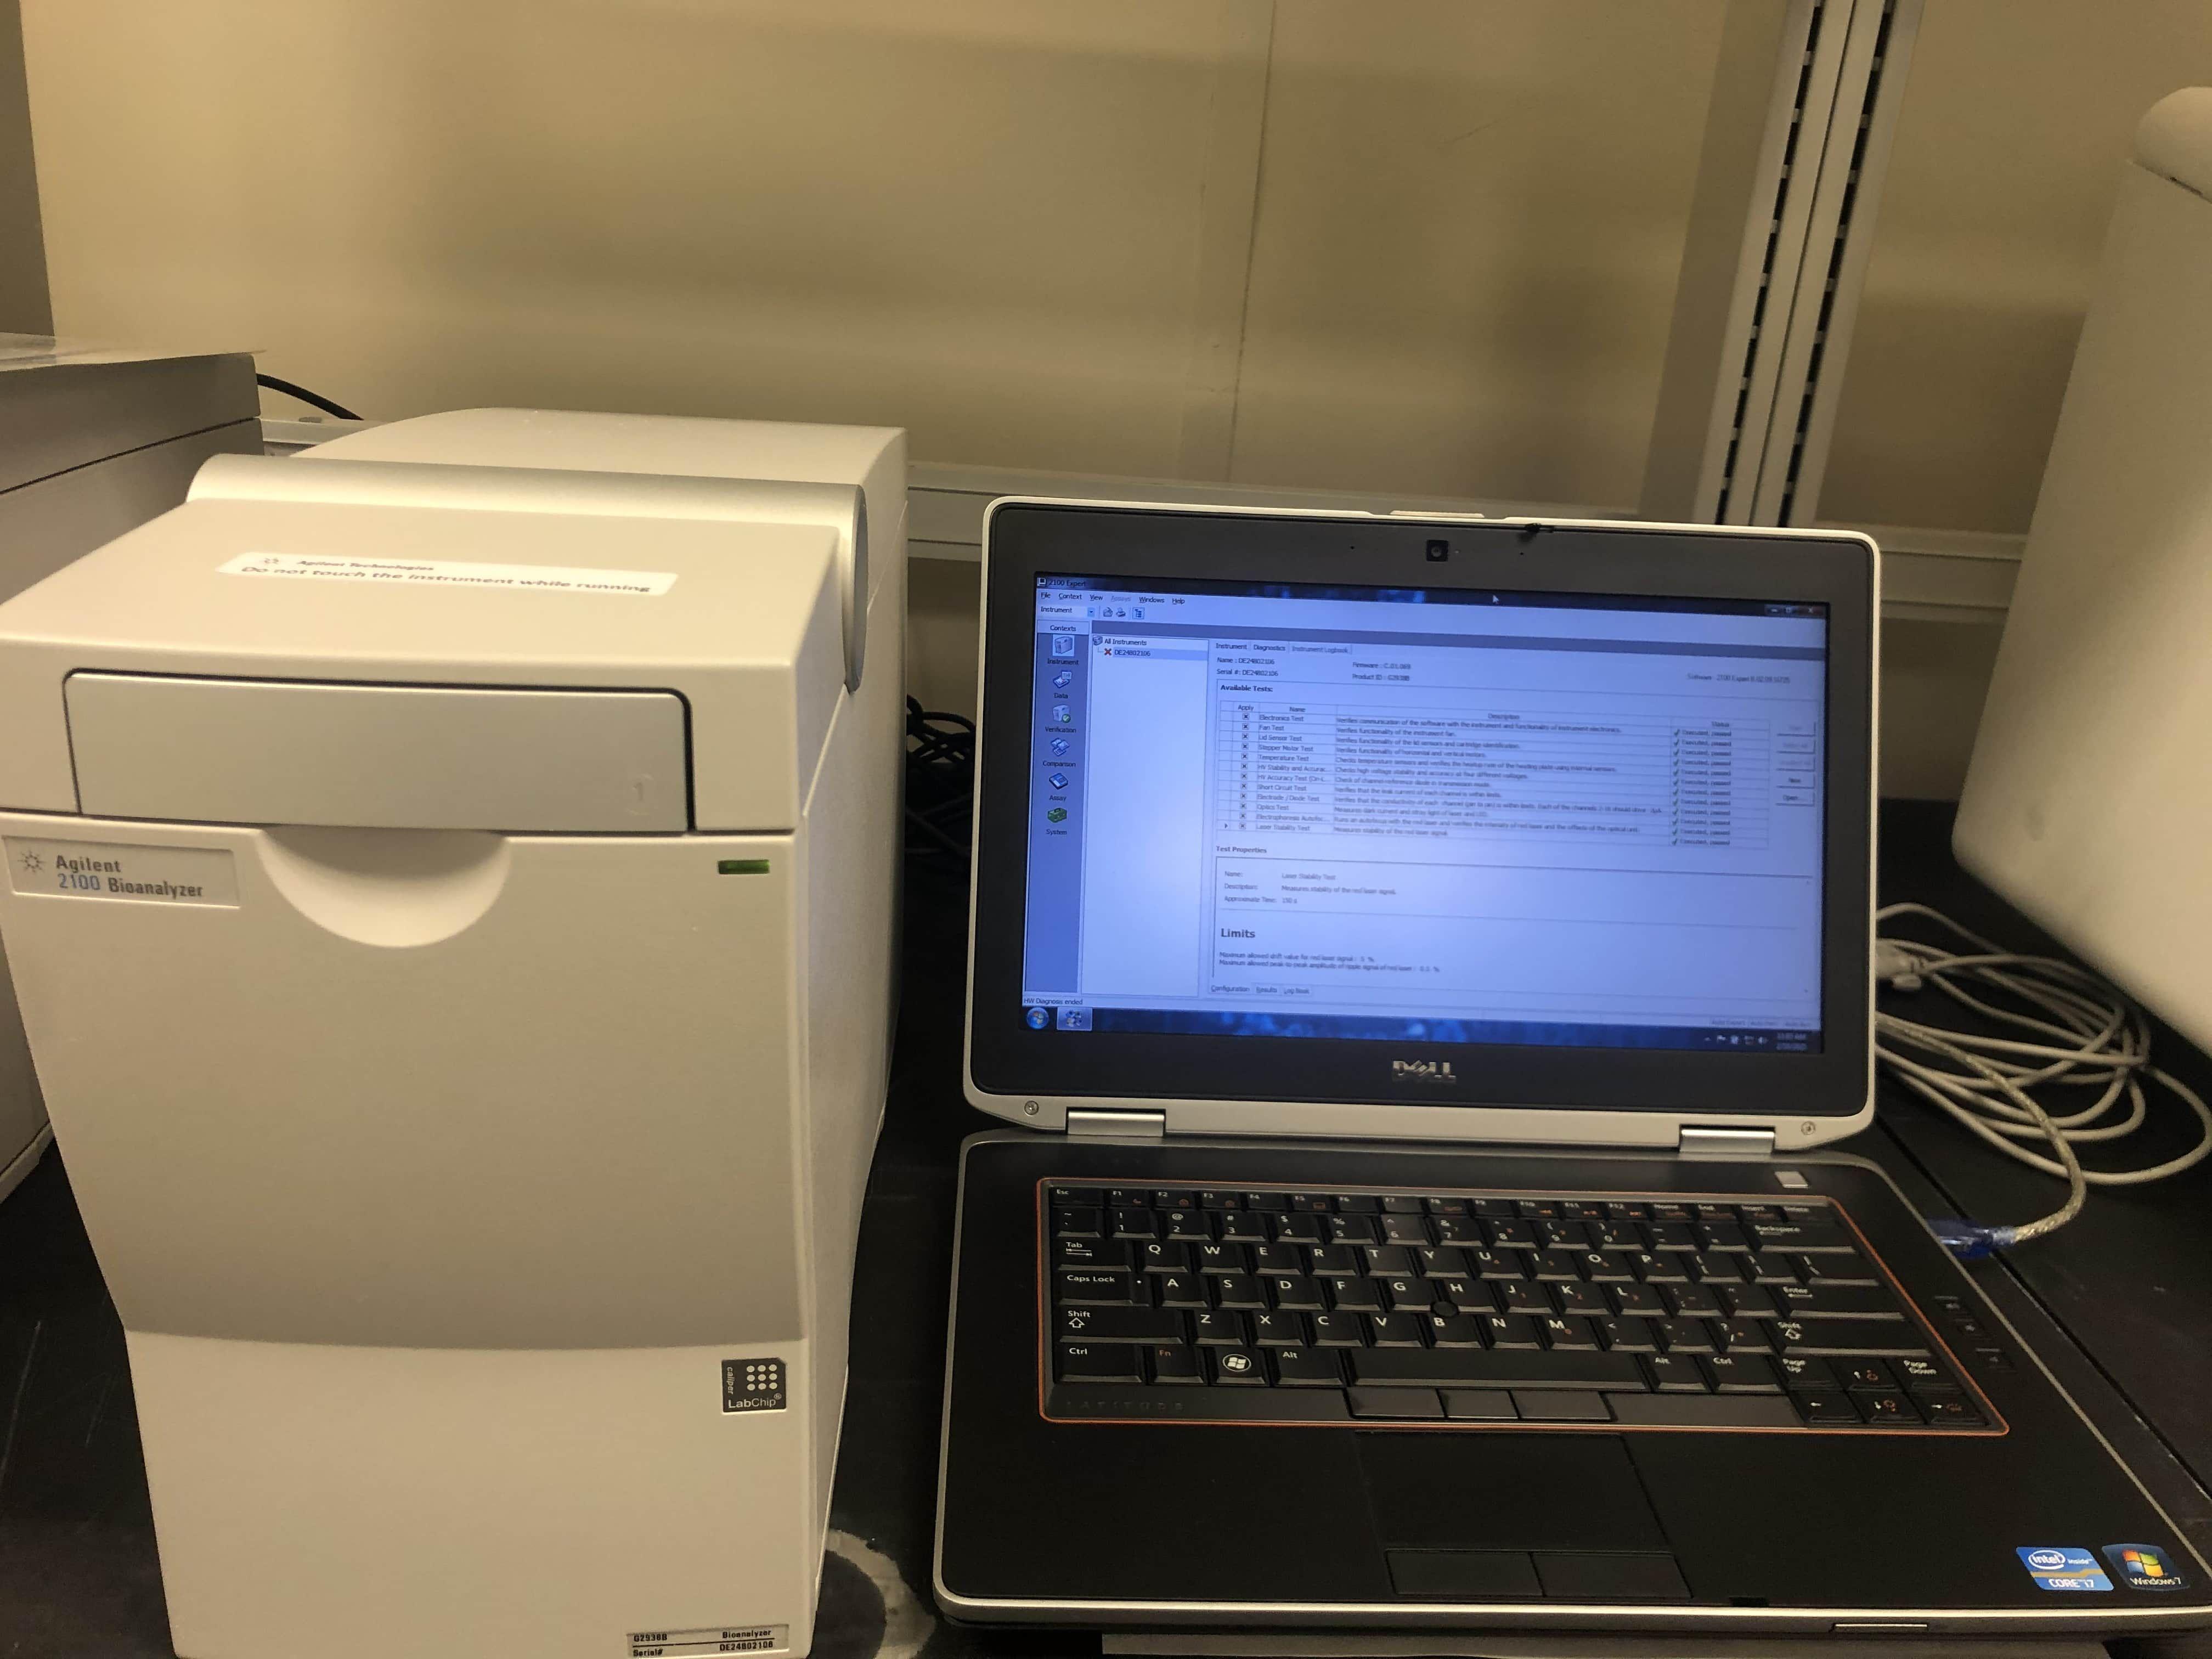 Agilent 2100 Model G2938B Bioanalyzer Complete system-New Agilent Reburb Unit-Like New Condition